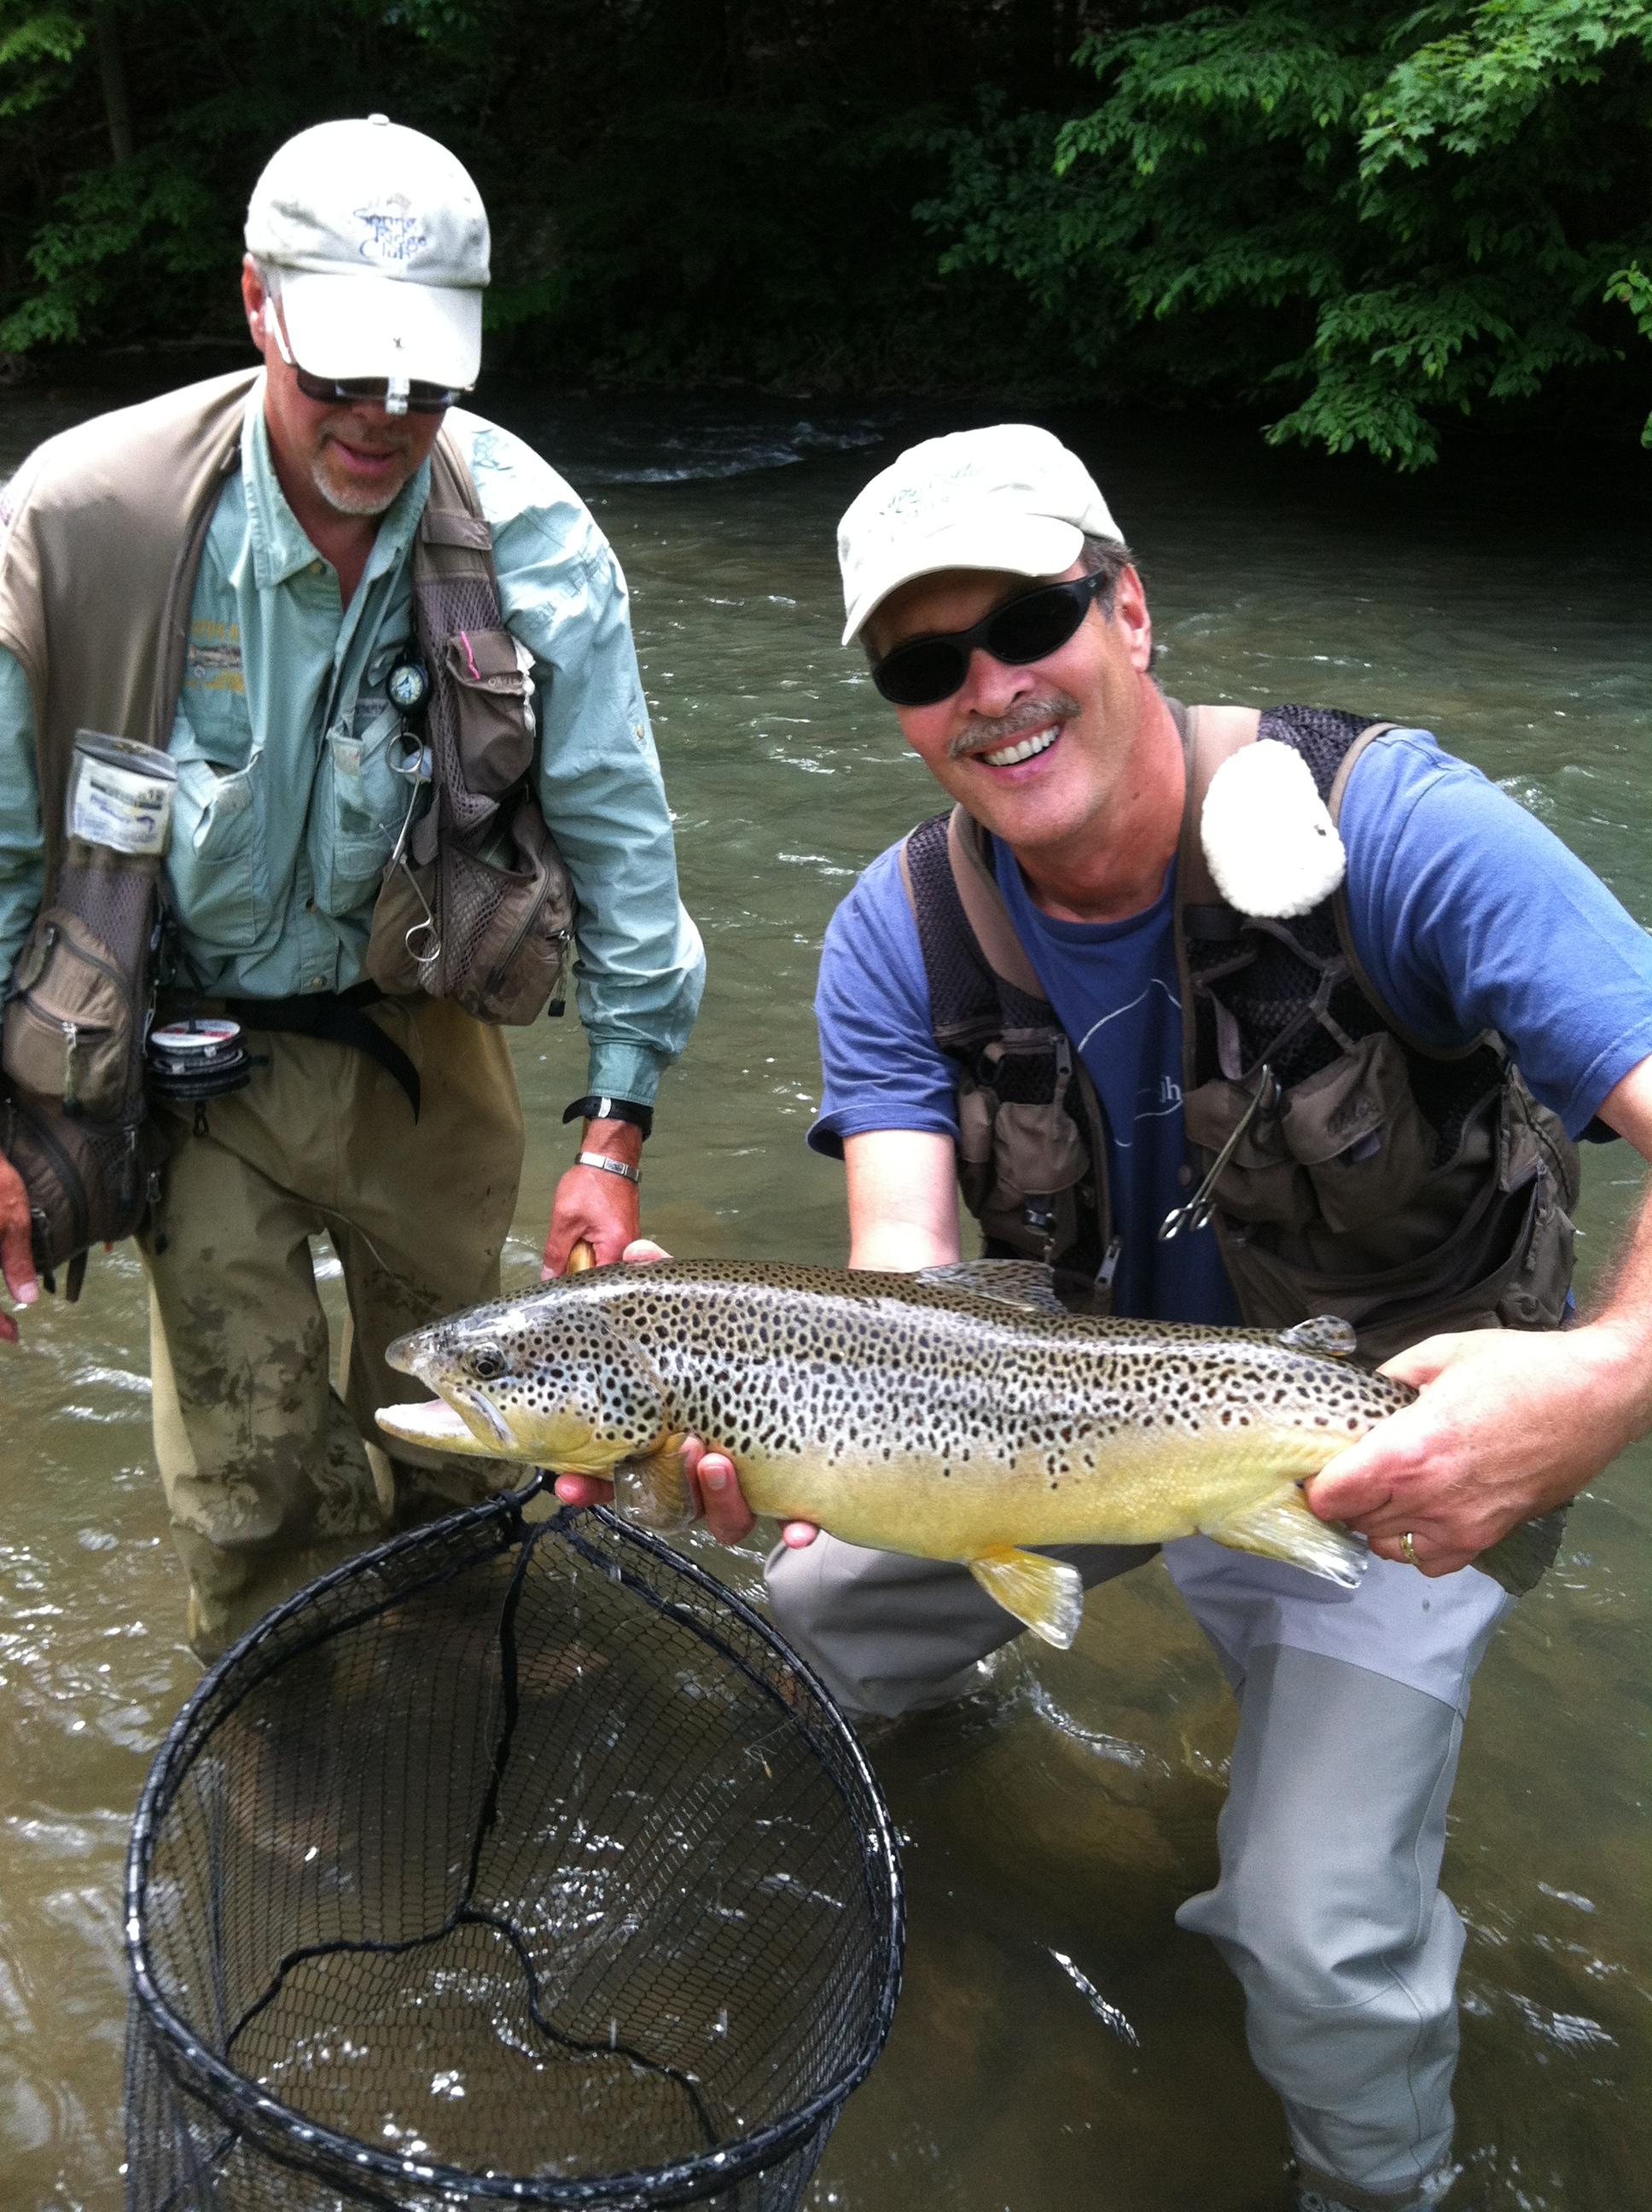 Spring ridge club s spruce creek slammin team surra for Spring creek pa fishing report